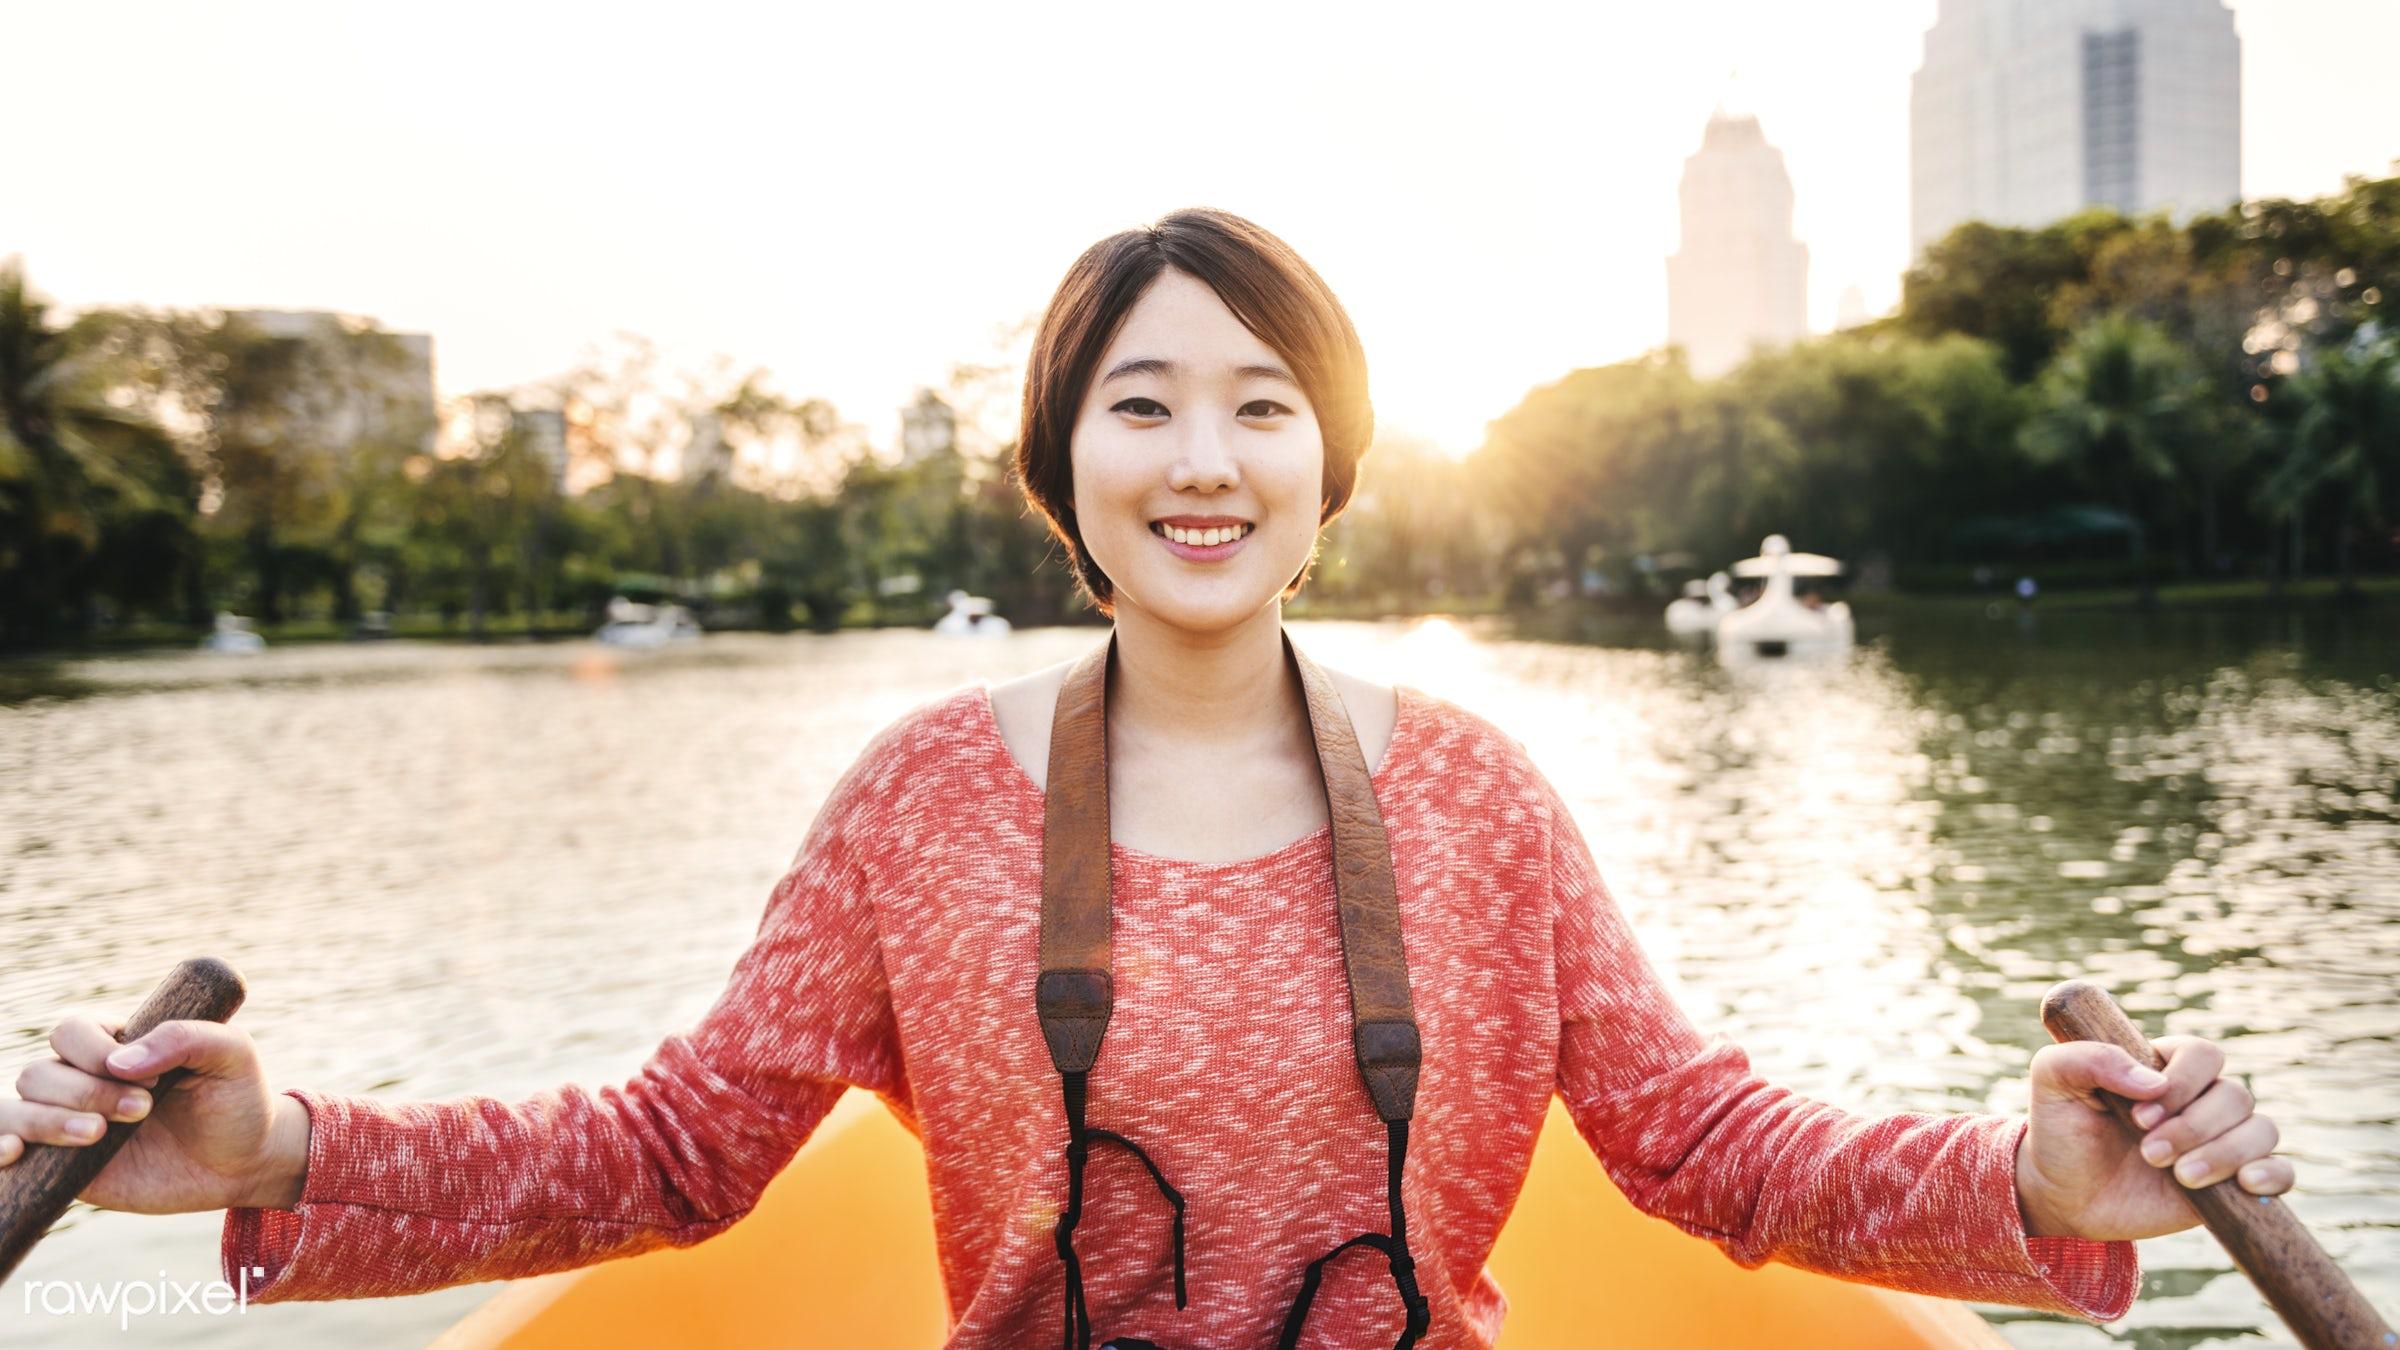 kayak, activity, adventure, asian ethnicity, beautiful, boat, camera, canoe, canoeing, casual, destination, enjoyment,...